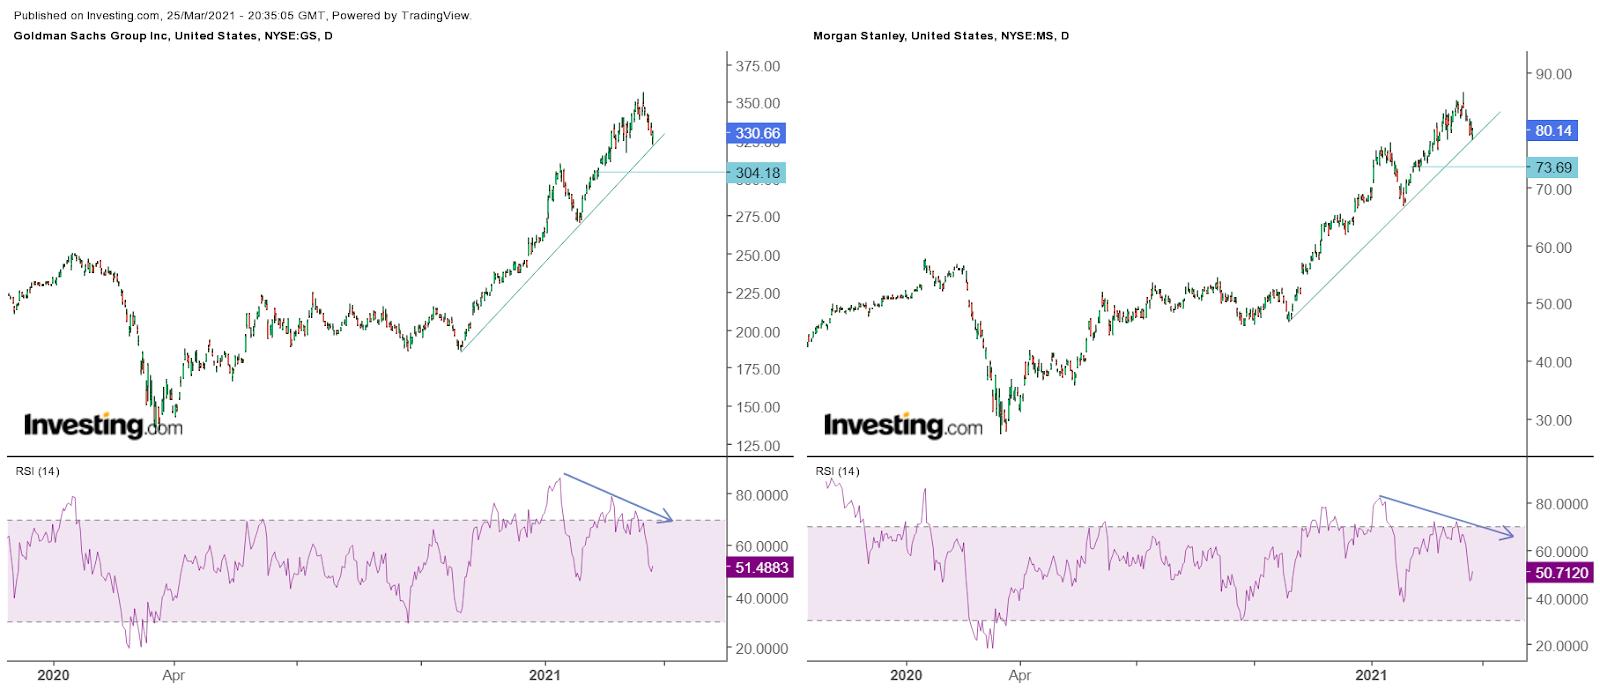 Goldman Sachs Günlük Grafik